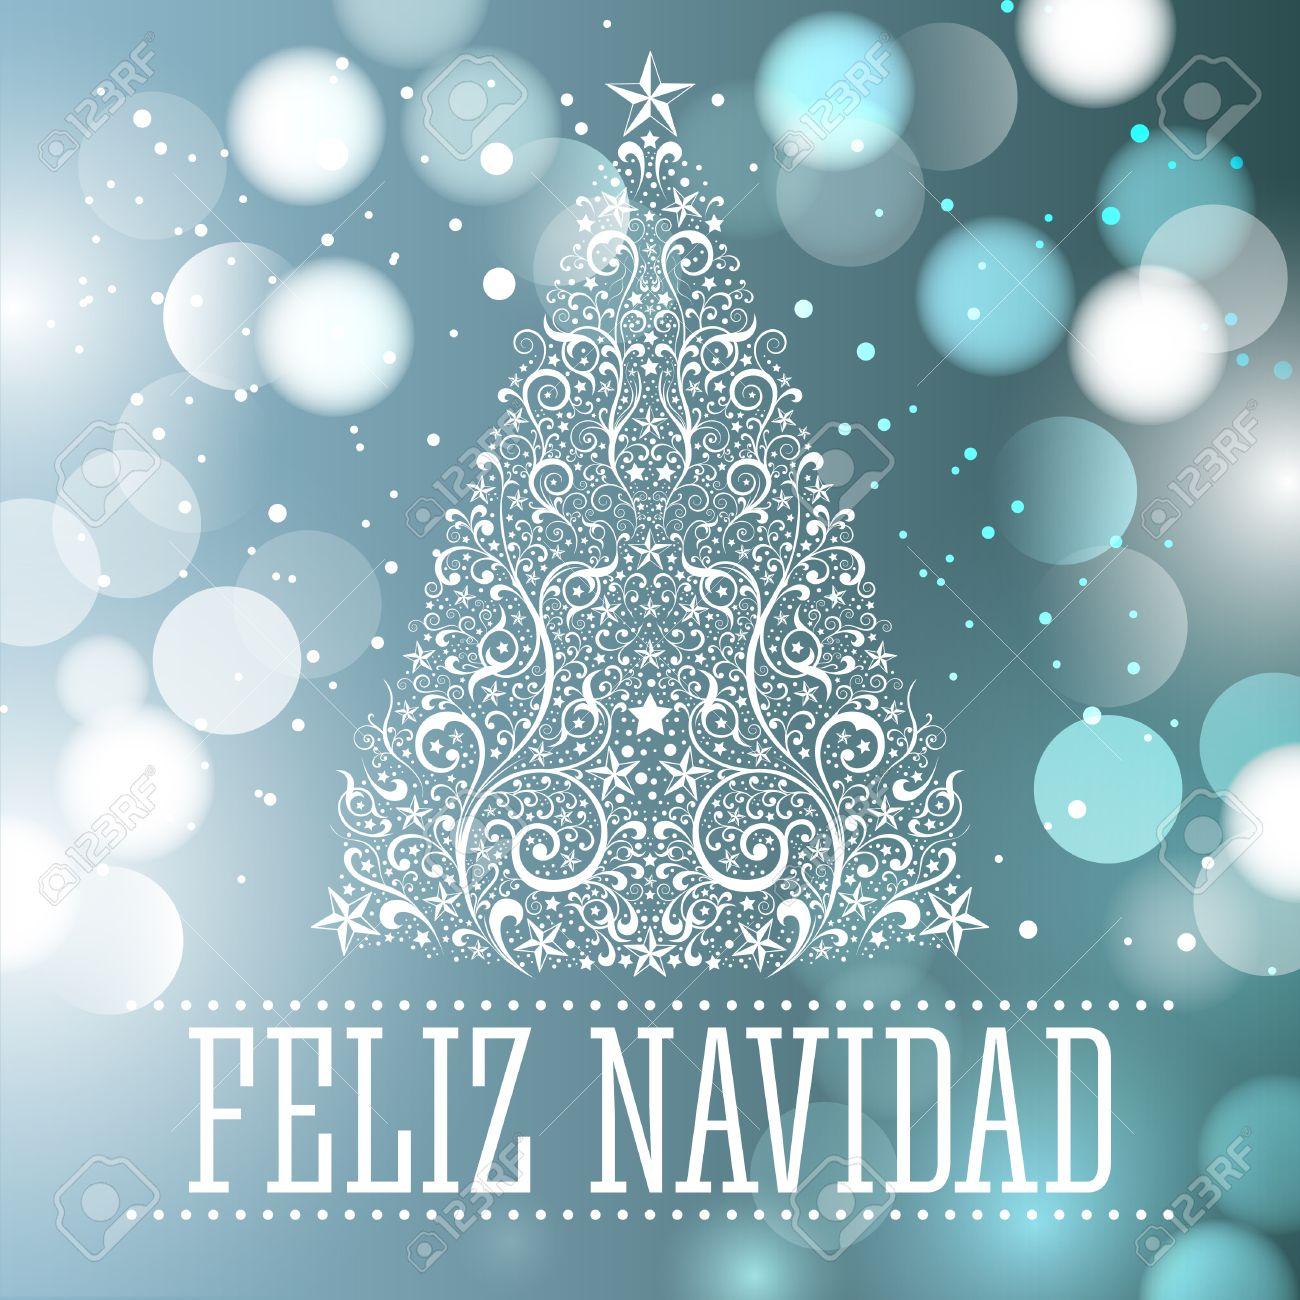 Feliz Navidad Joyeux Noel 2019.Feliz Navidad Joyeux Noel Espagnol Carte De Texte Vecteur Fantaisie Fond